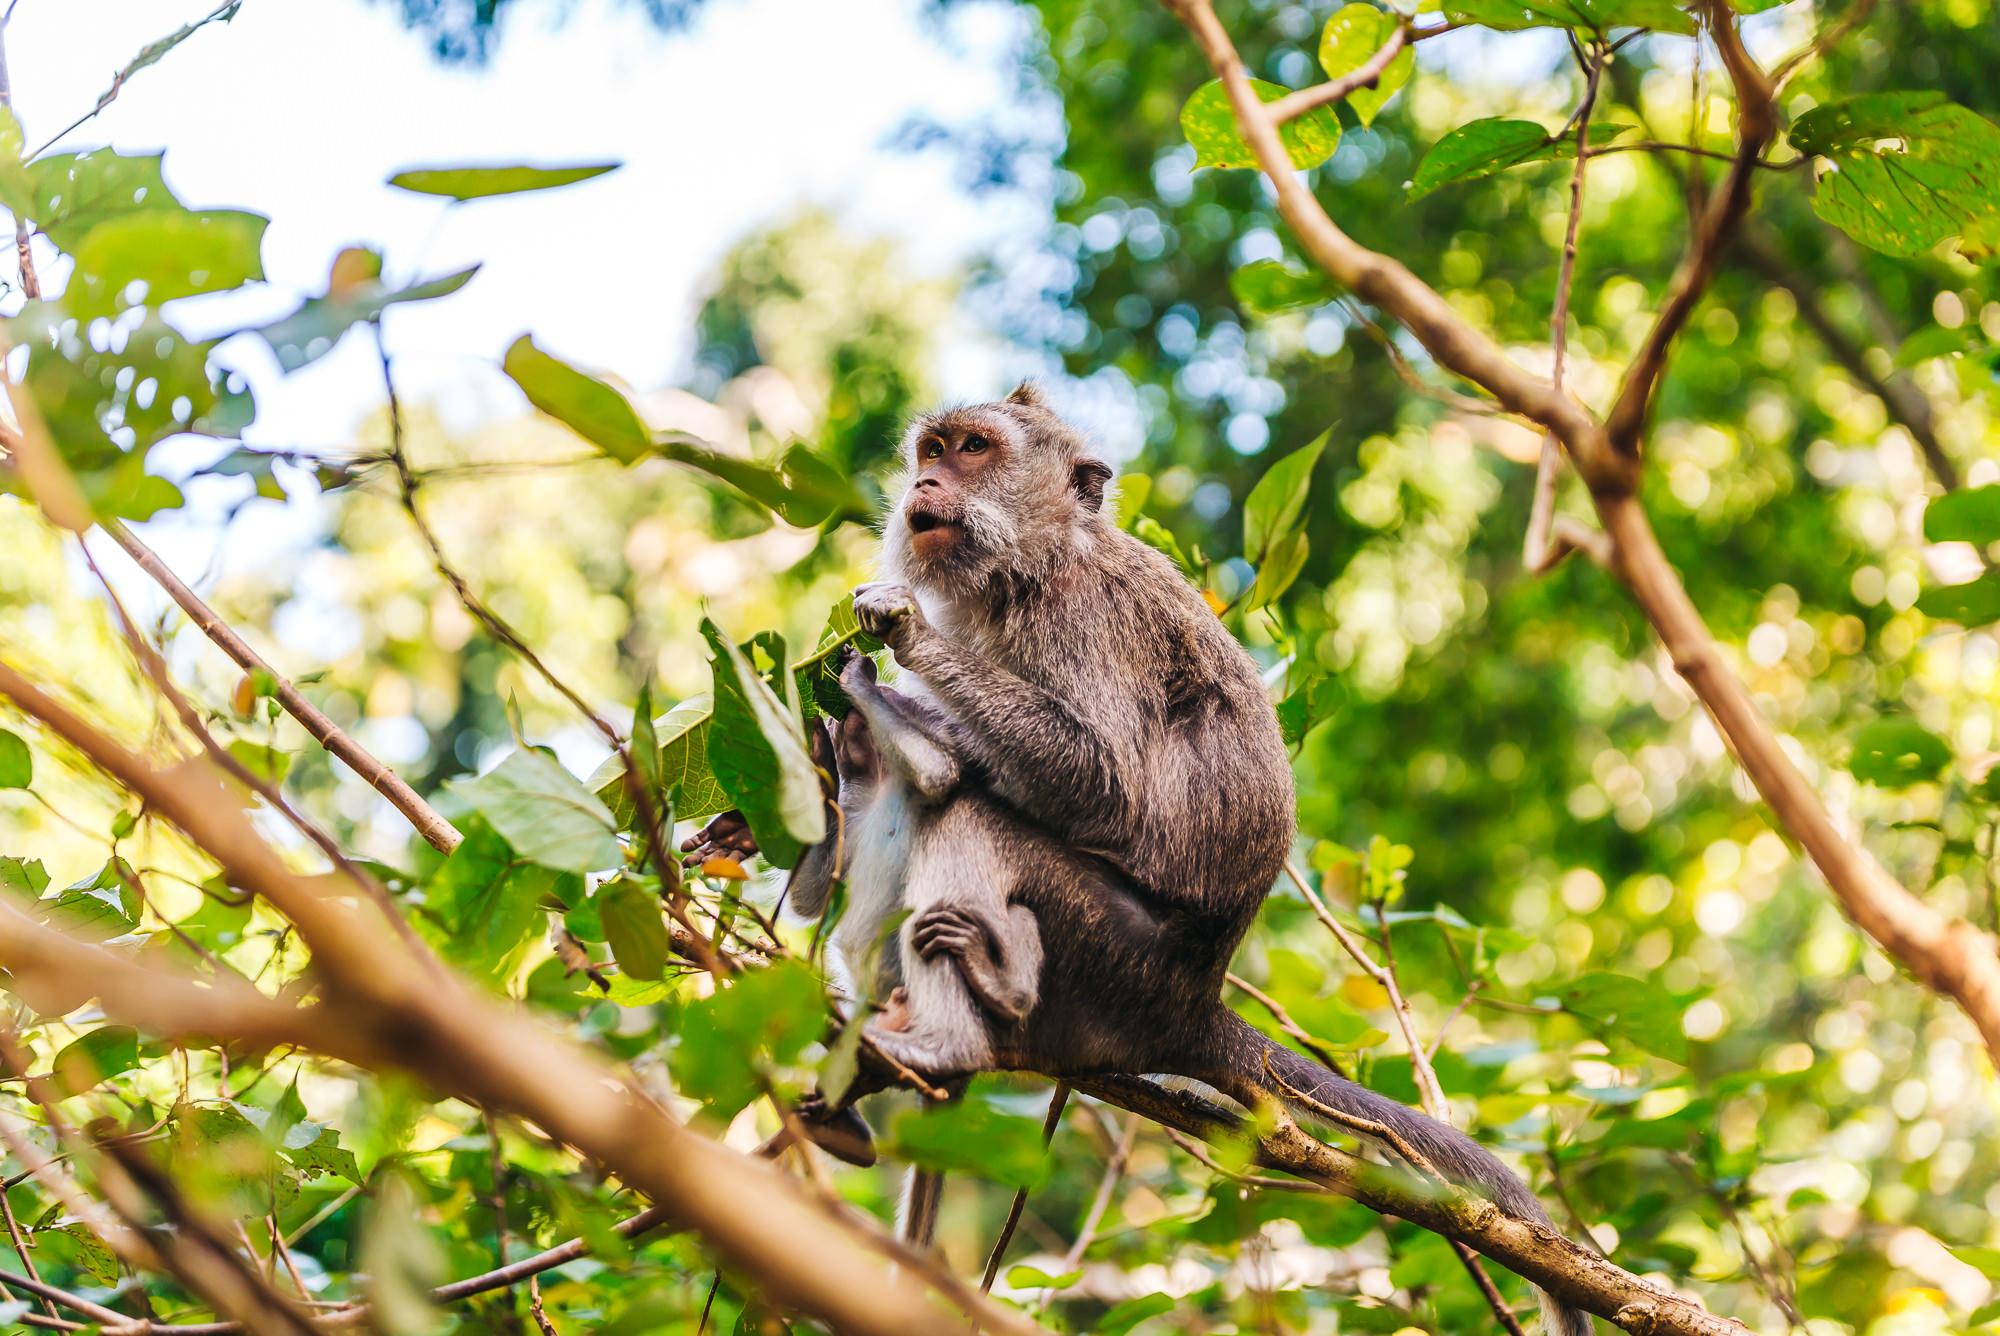 Balinese Long-tailed Monkeys at Sacred Monkey Forest